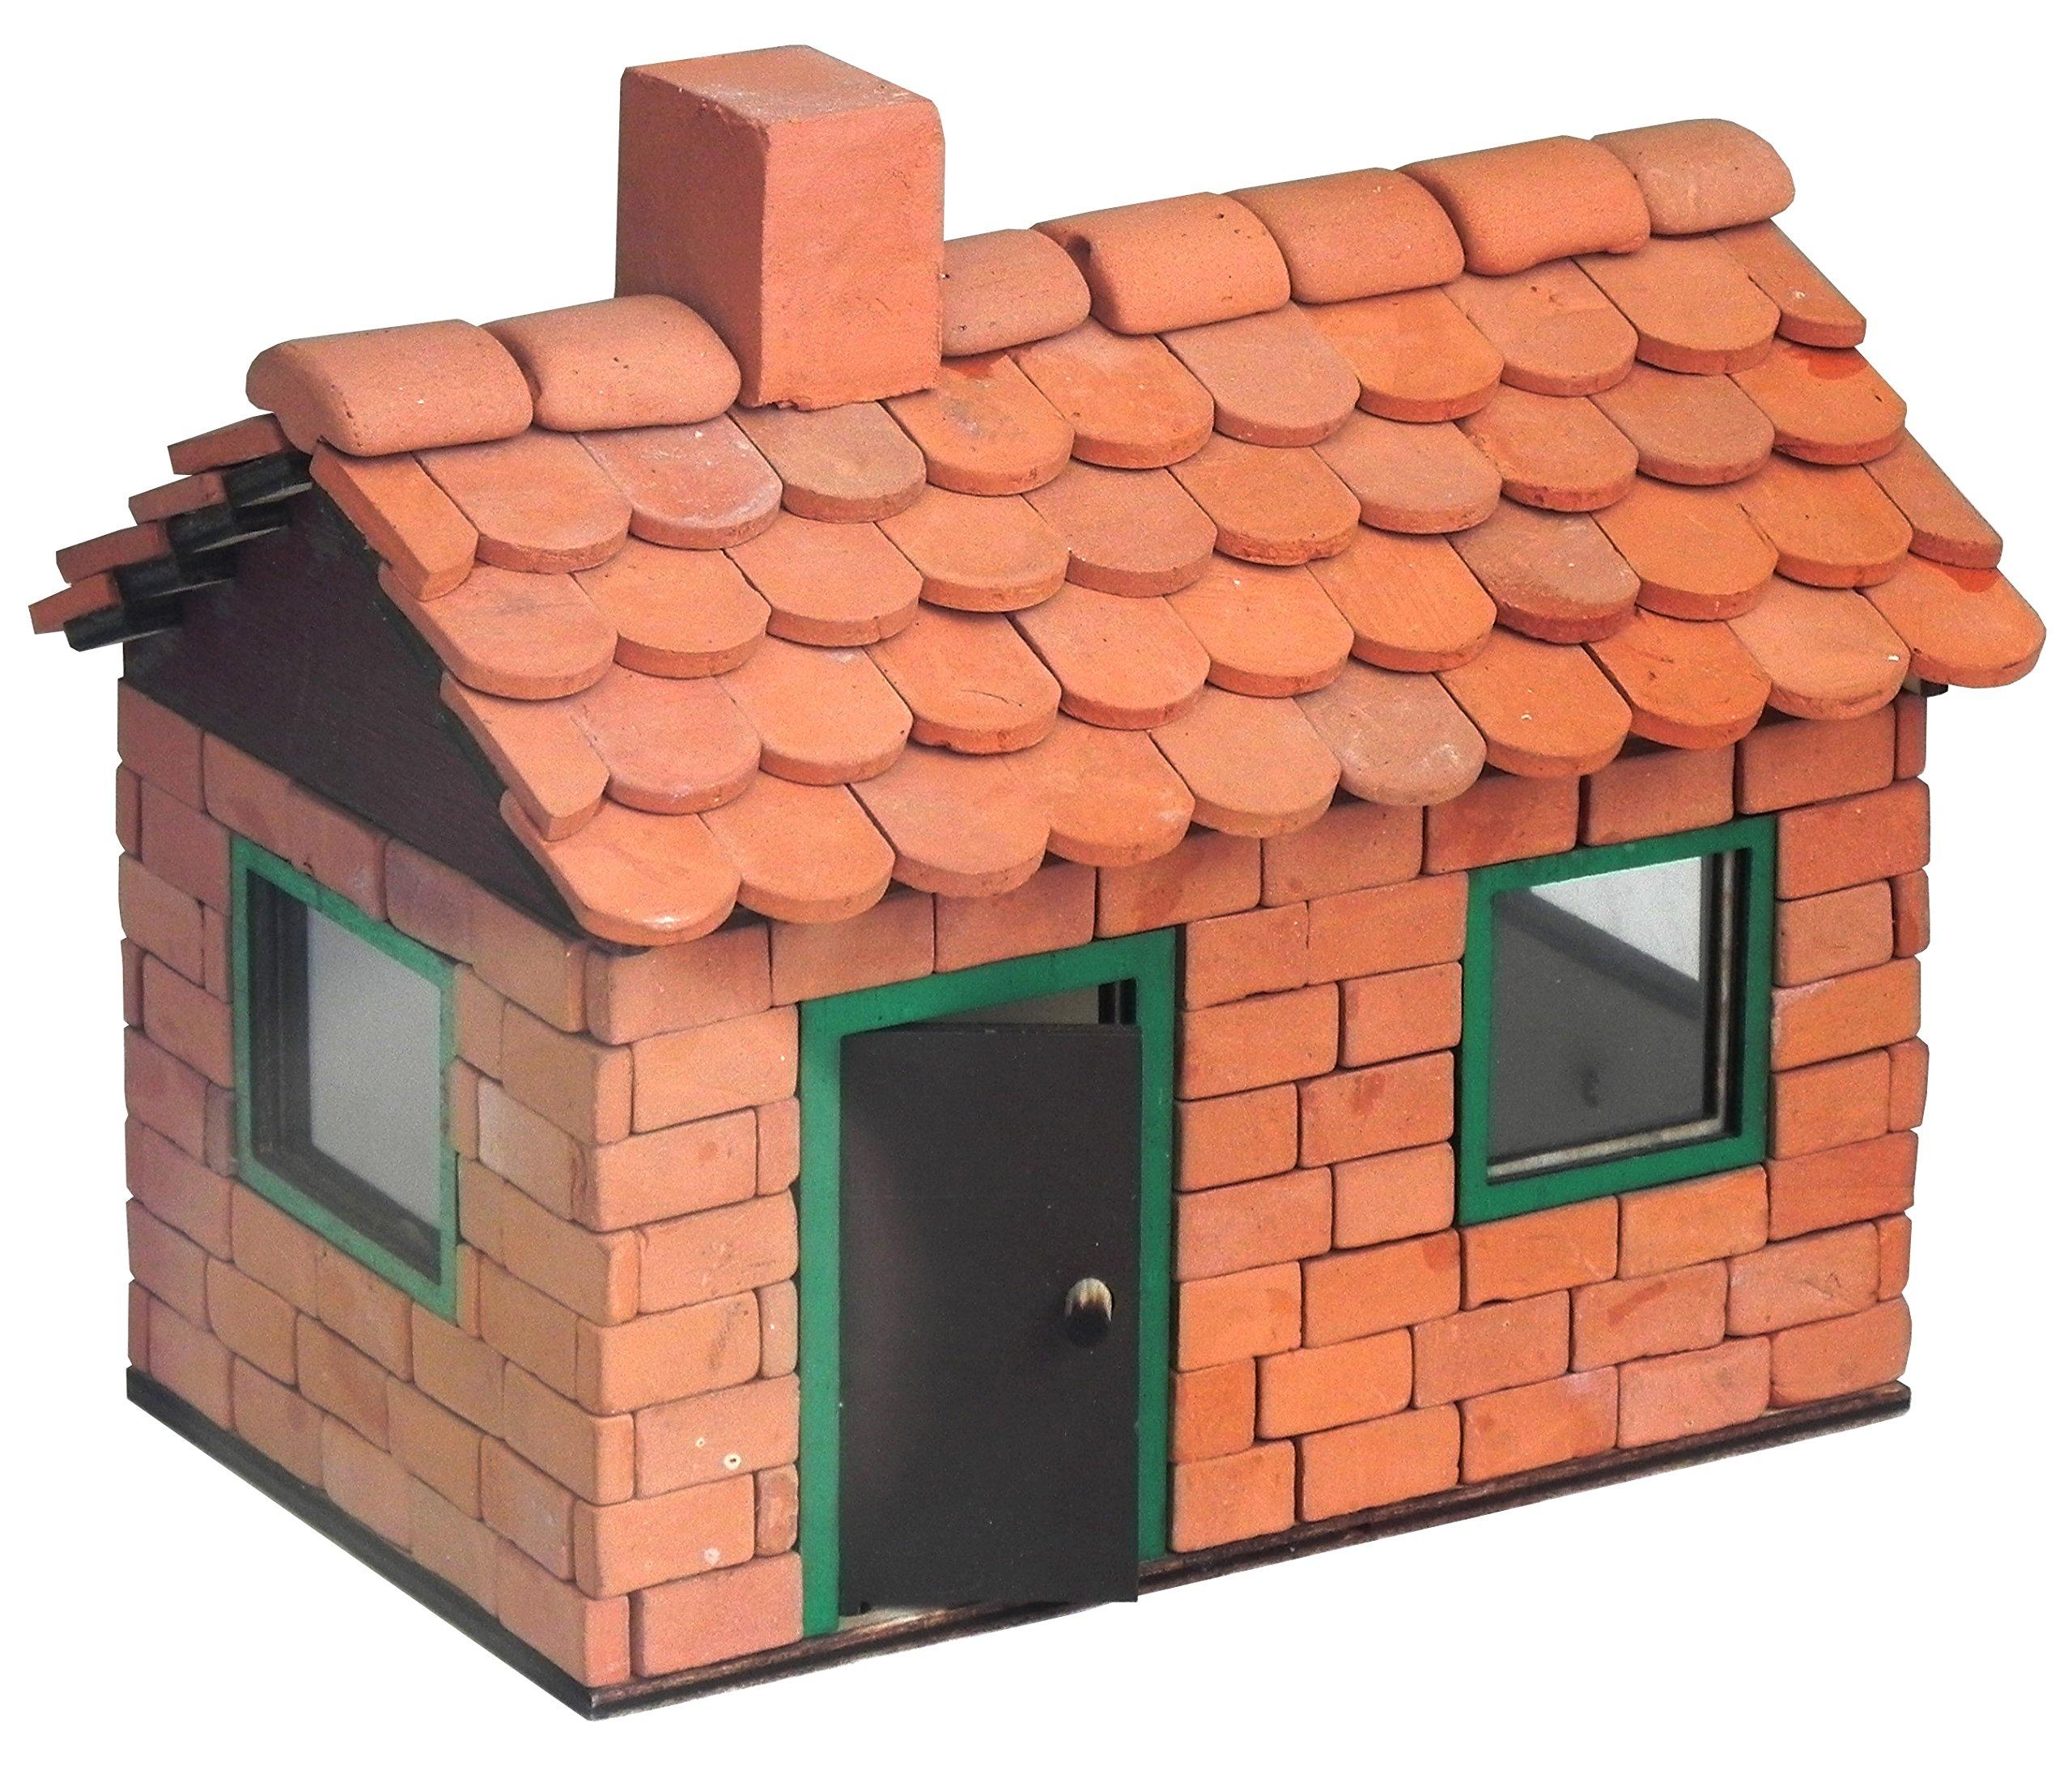 ALEA Mosaic Brick Building Set, Leo House with Fireplace